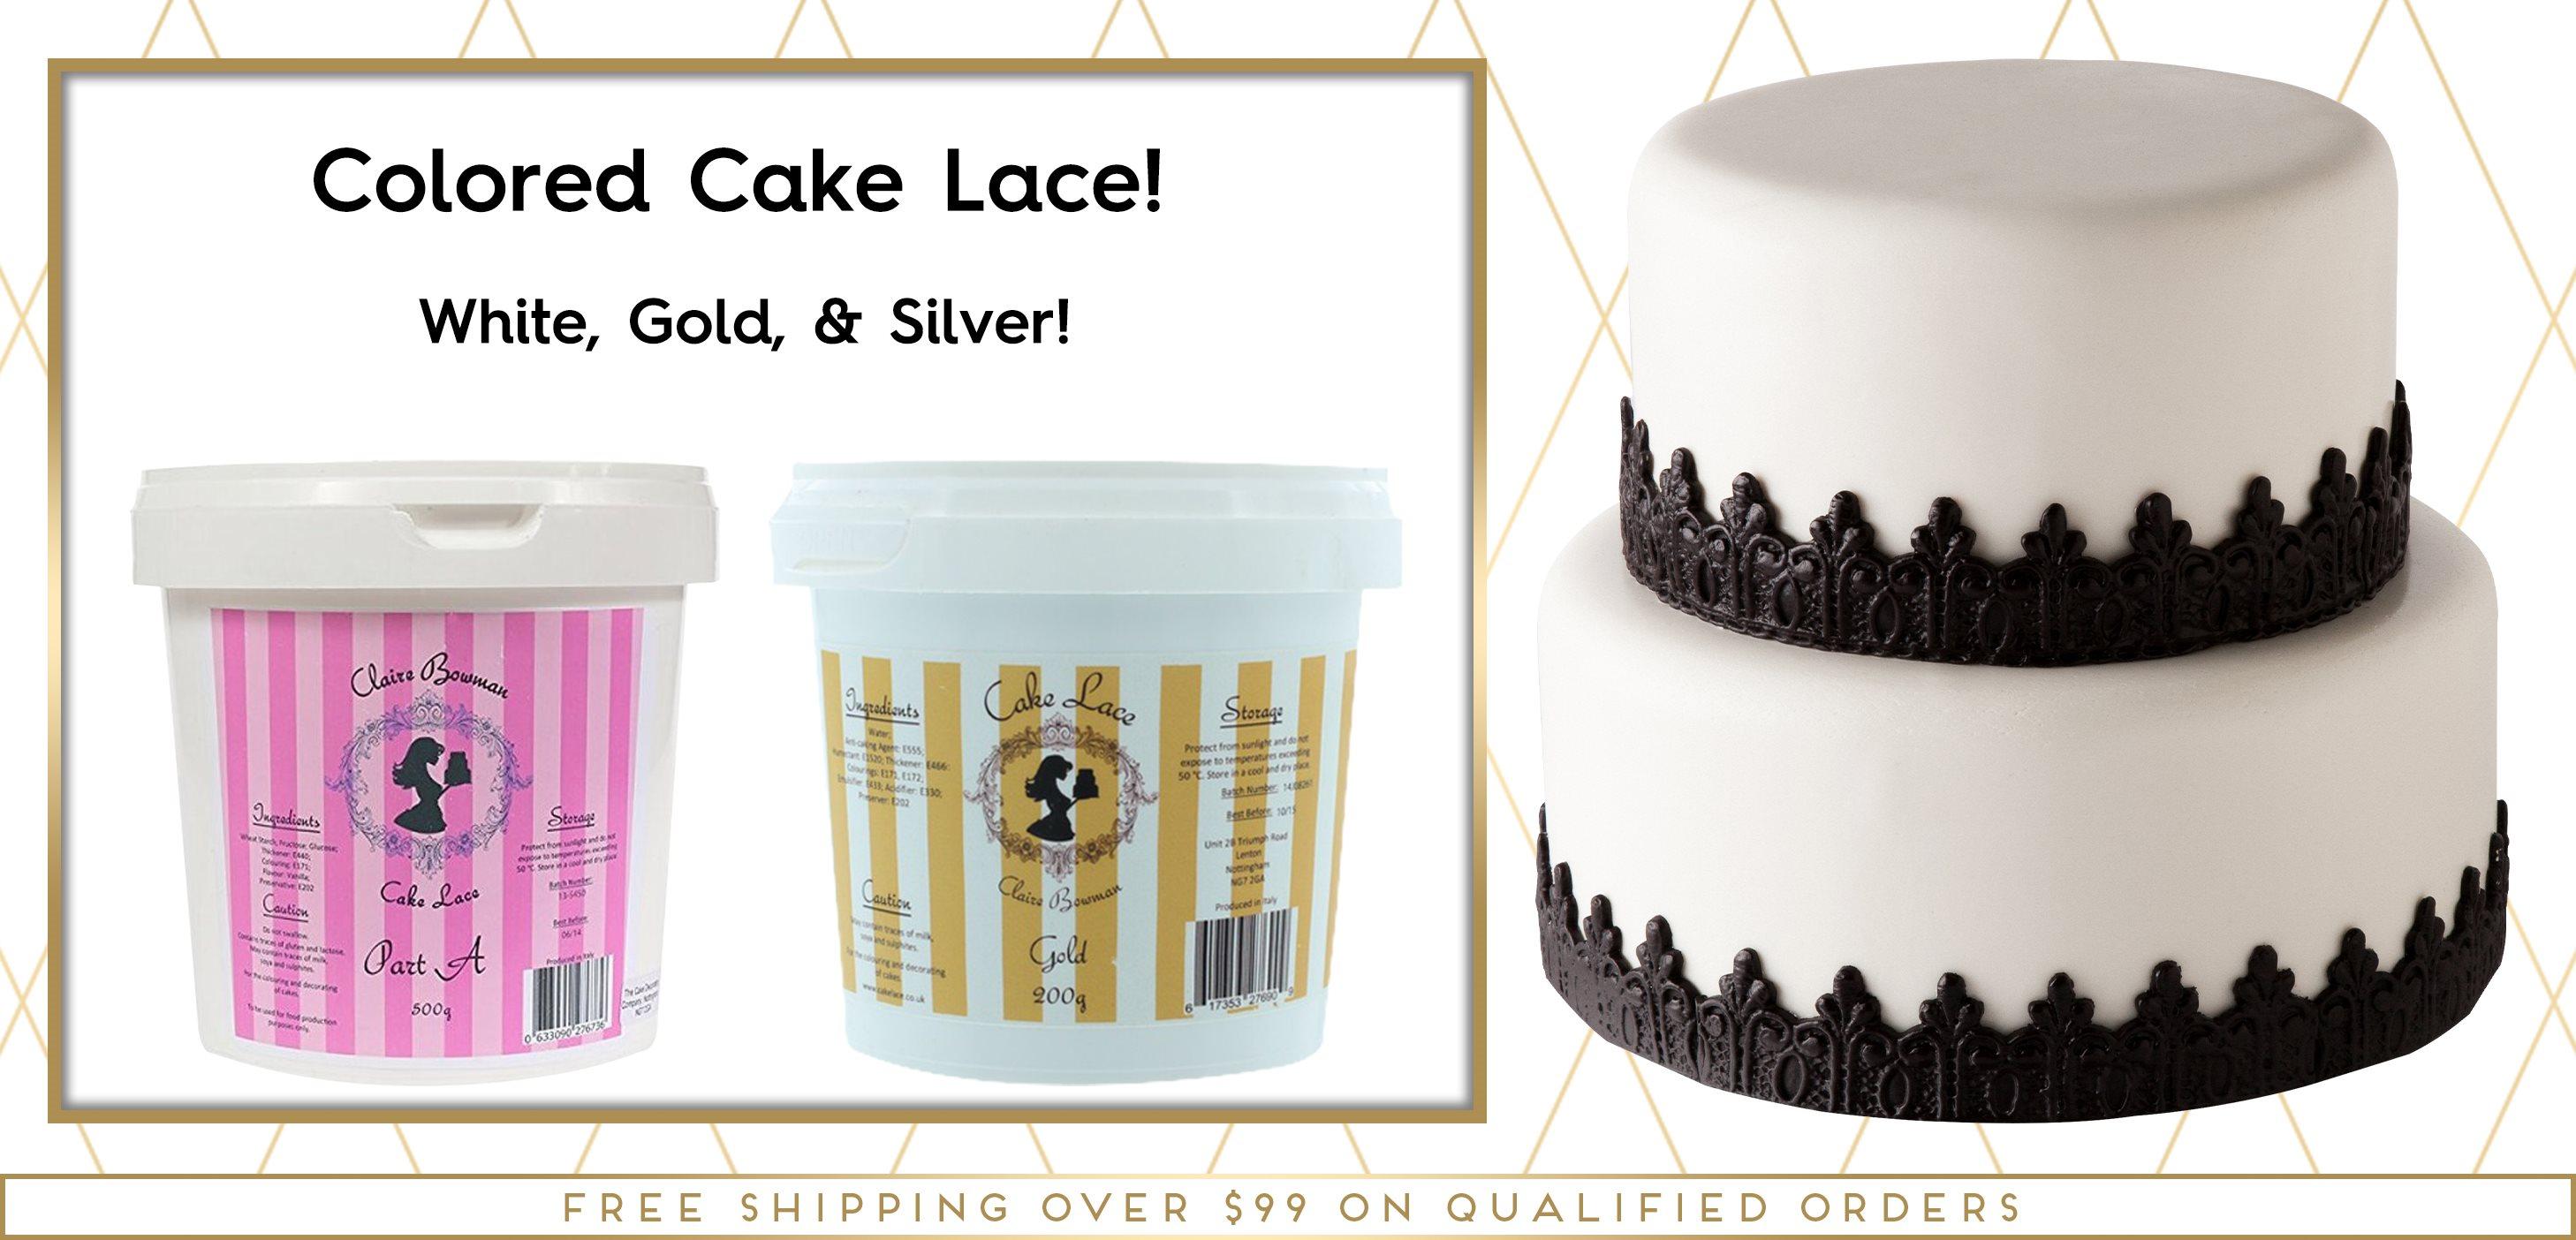 ClaireBowman Cake Lace